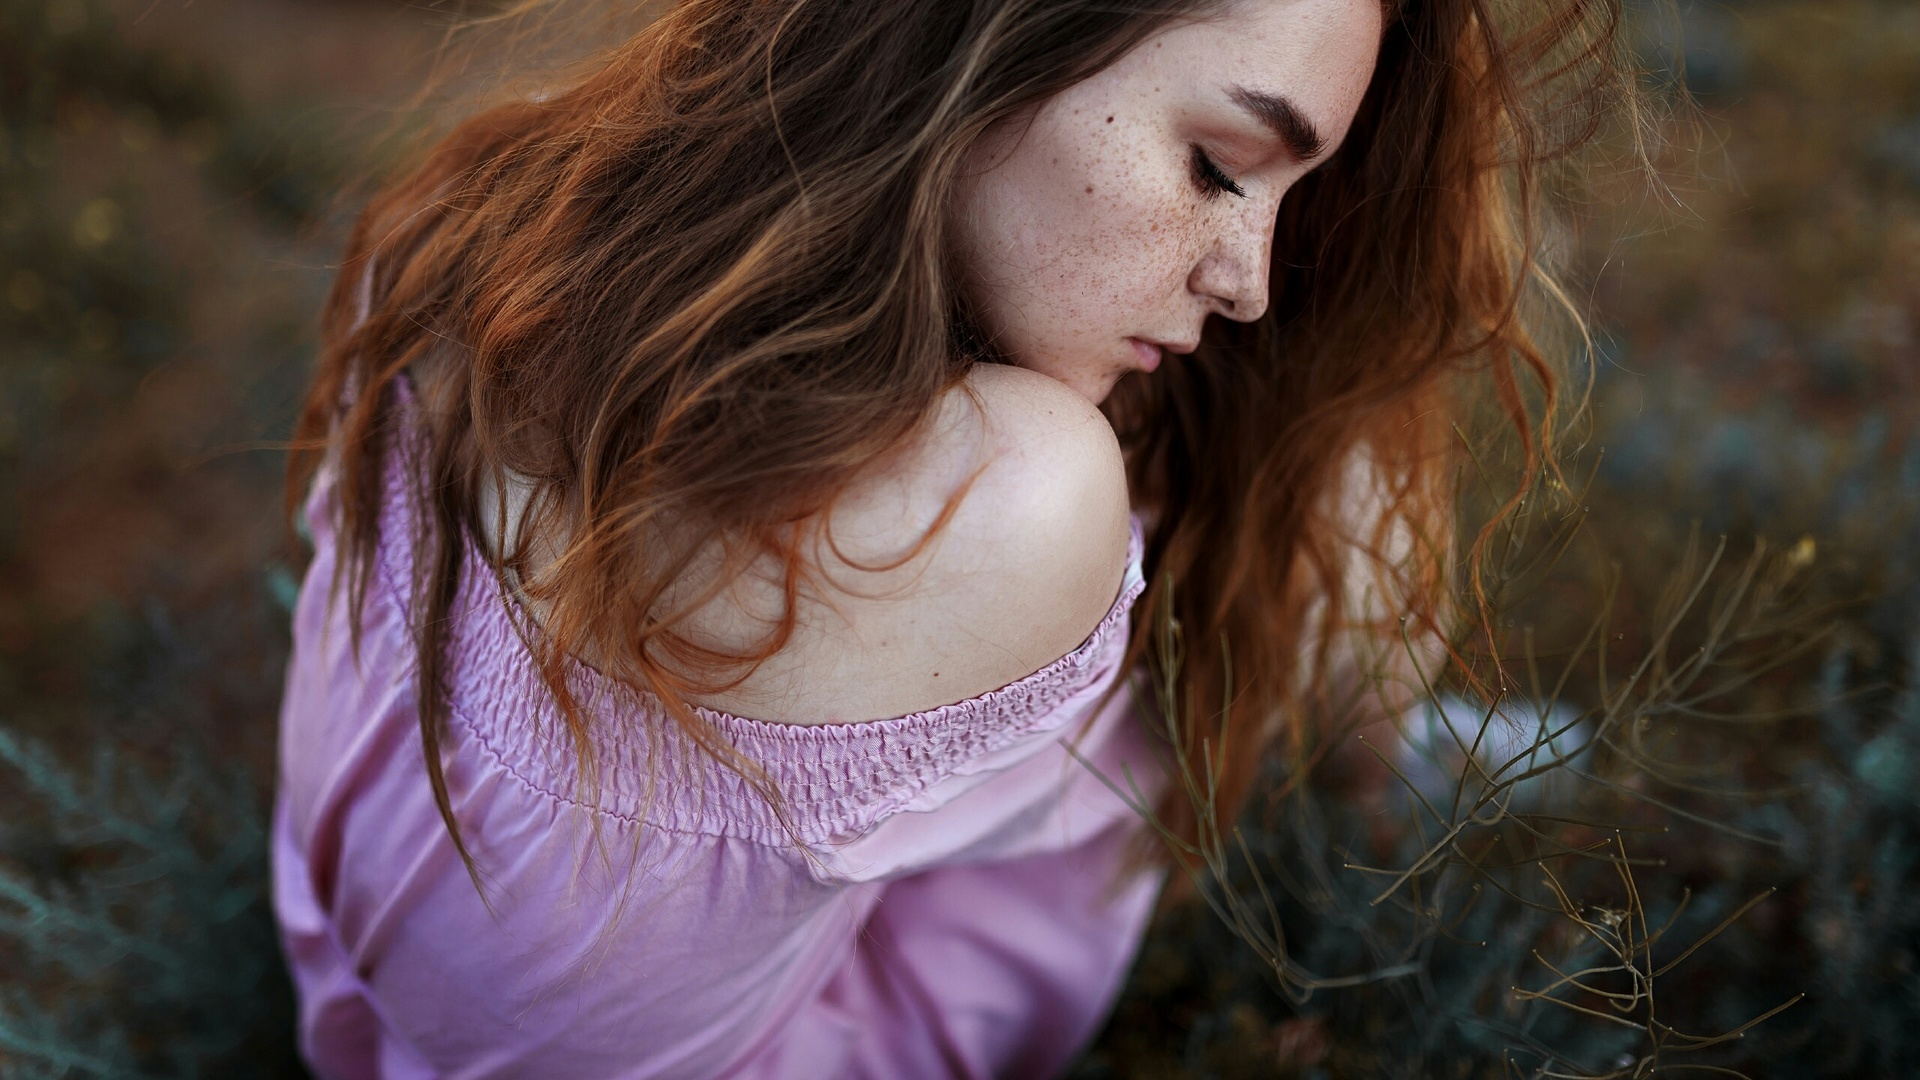 девушка, на природе, проф фото, ульяна найденкова